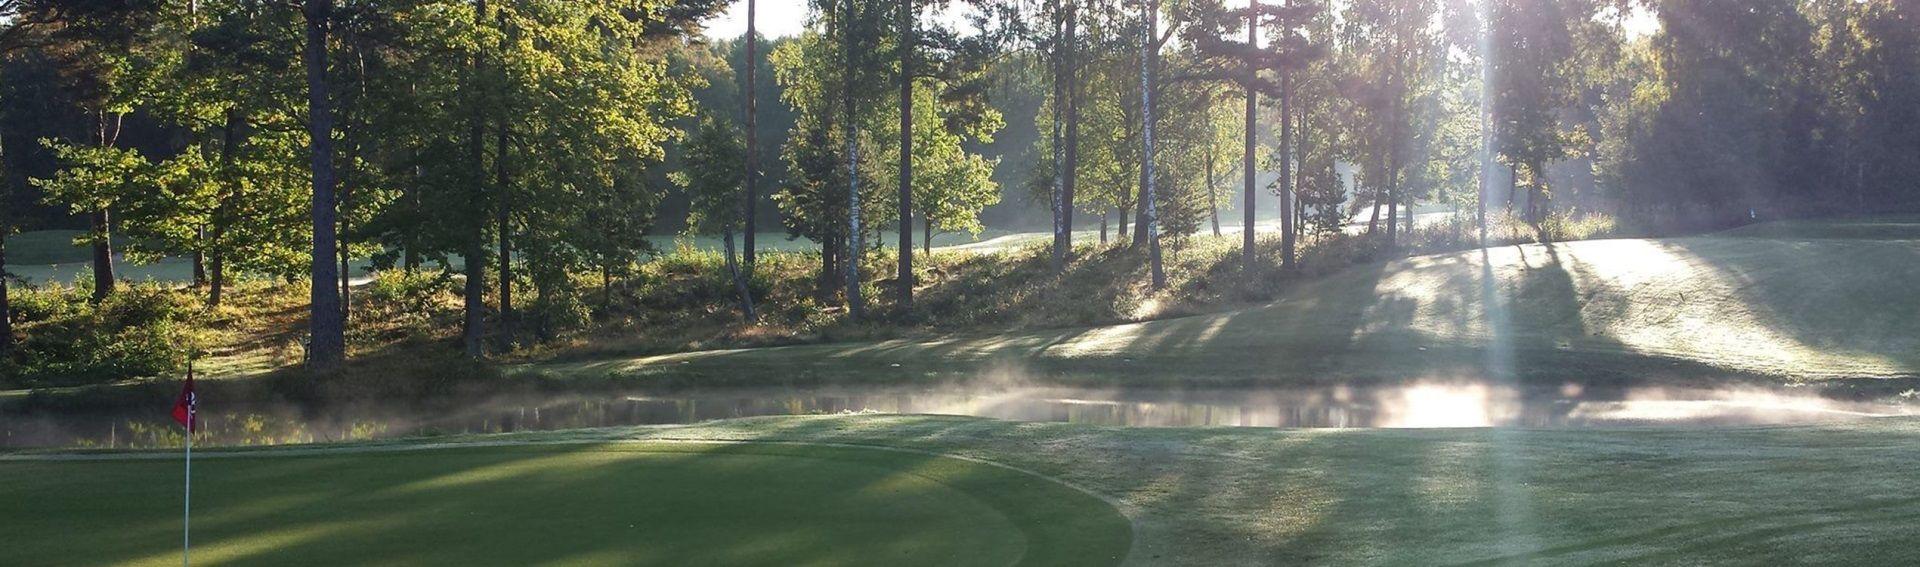 A golfklubb cover picture